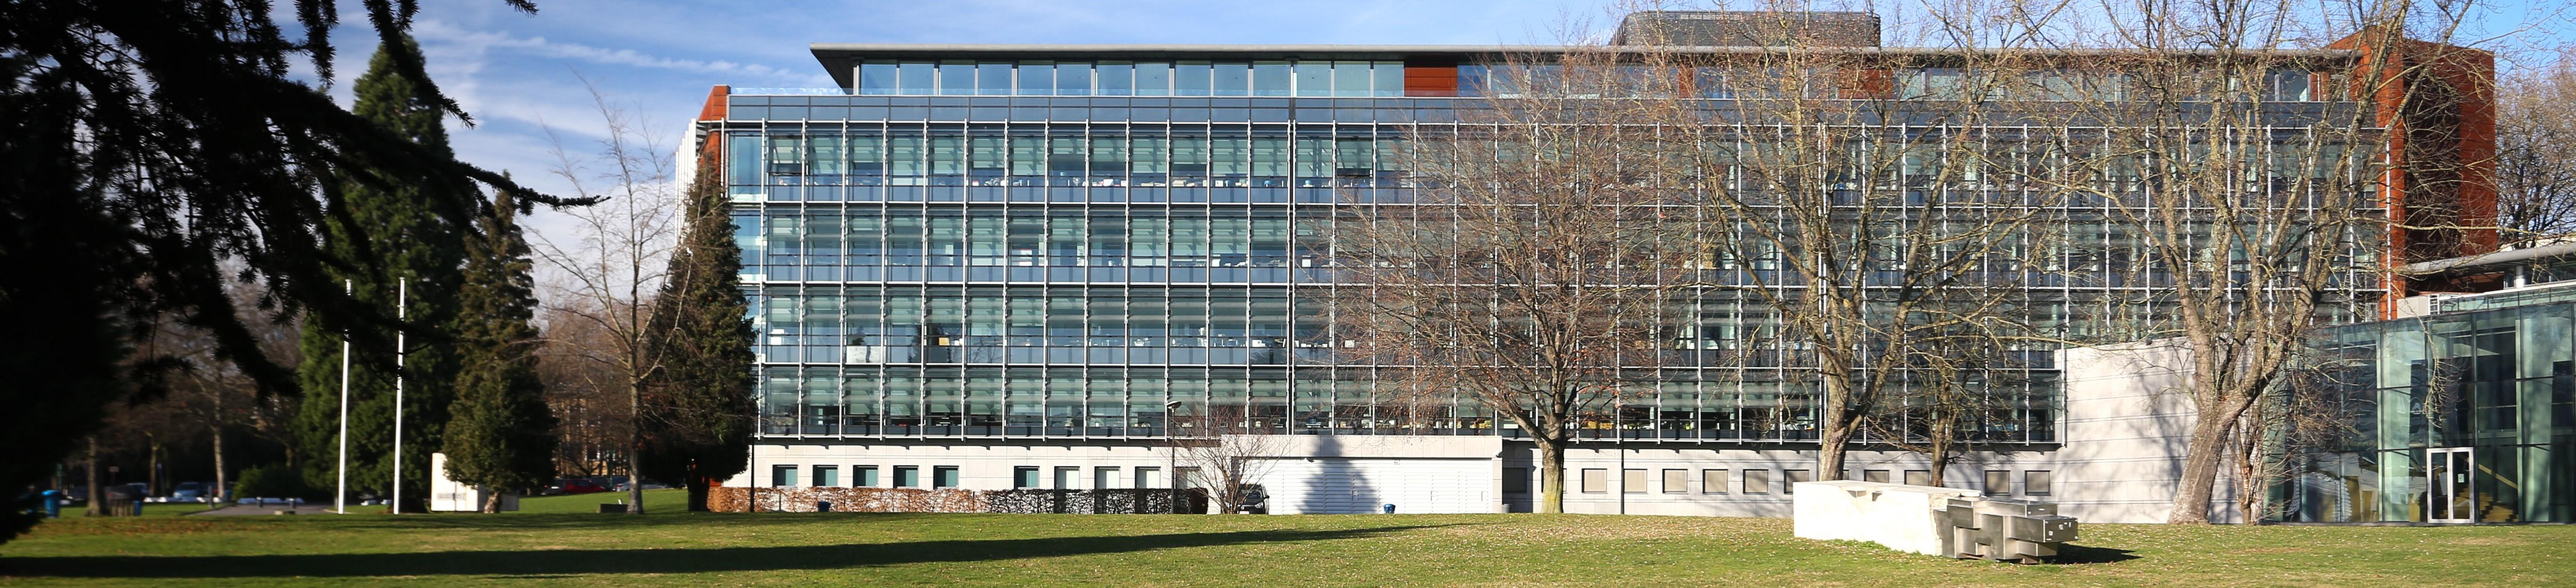 BPG Avocats Palais du Verre de Charleroi Christophe Vandercam